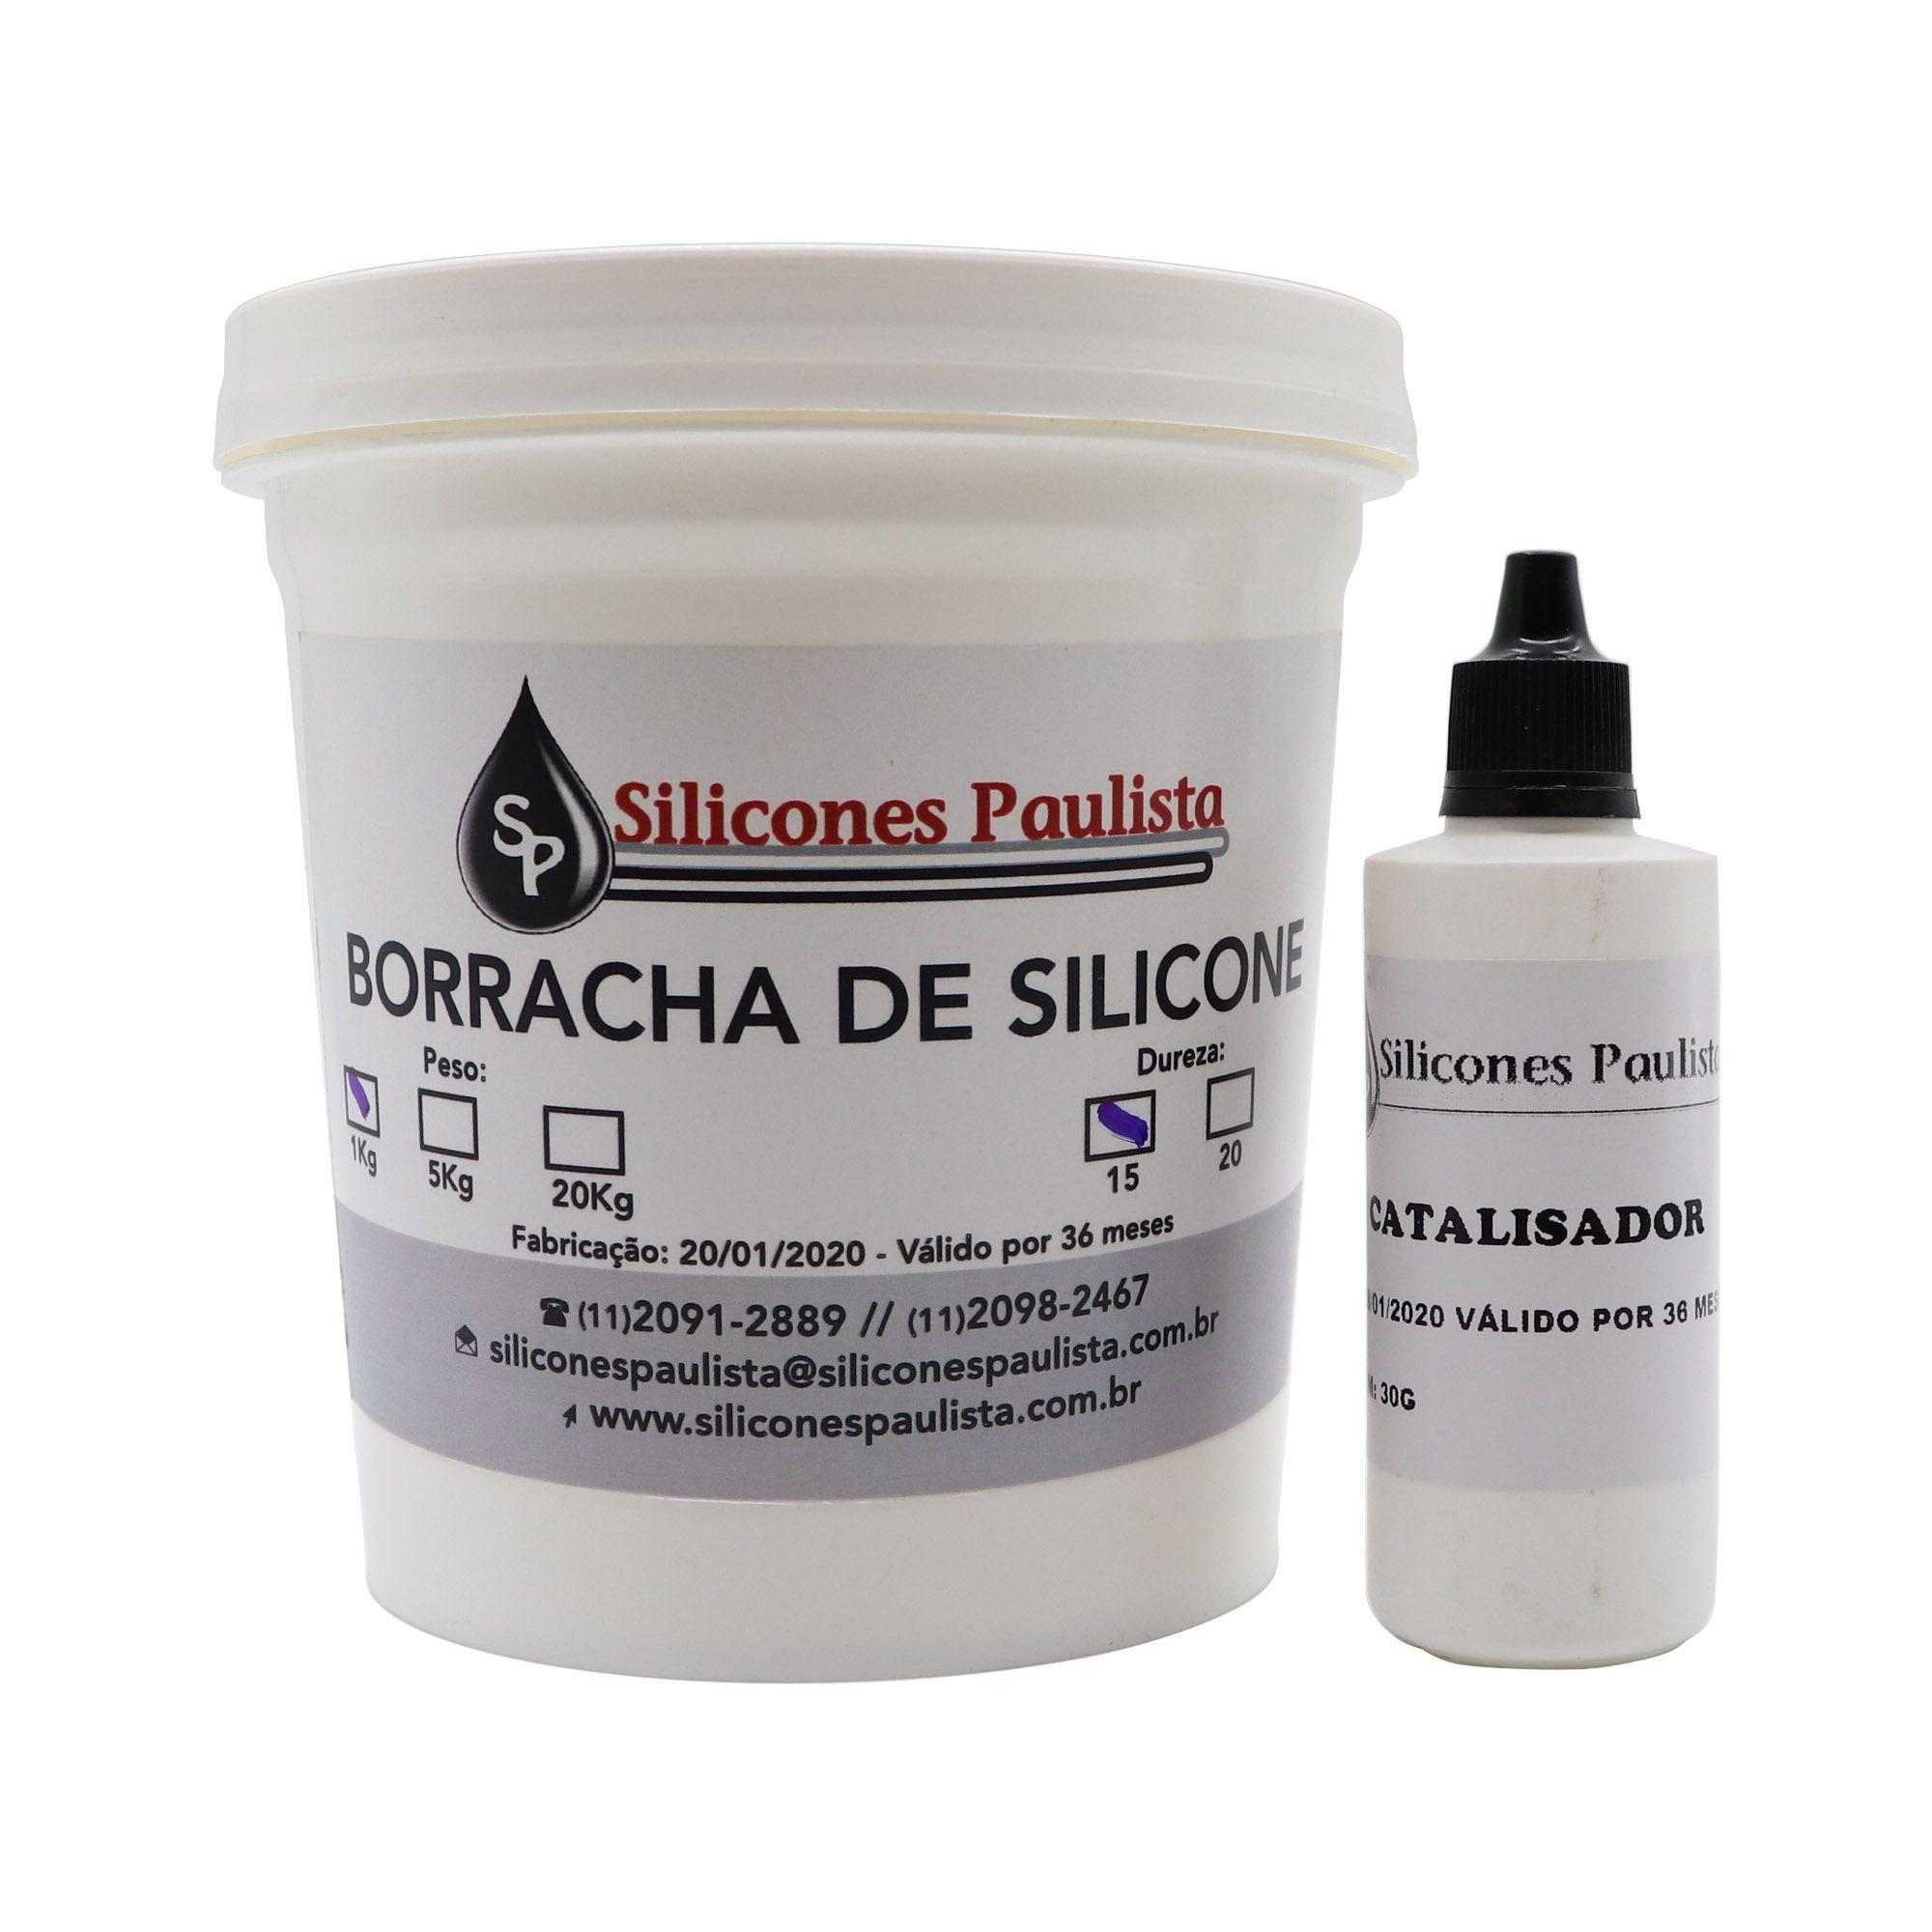 Borracha de Silicone Laranja para artesanato - 1kg/30g